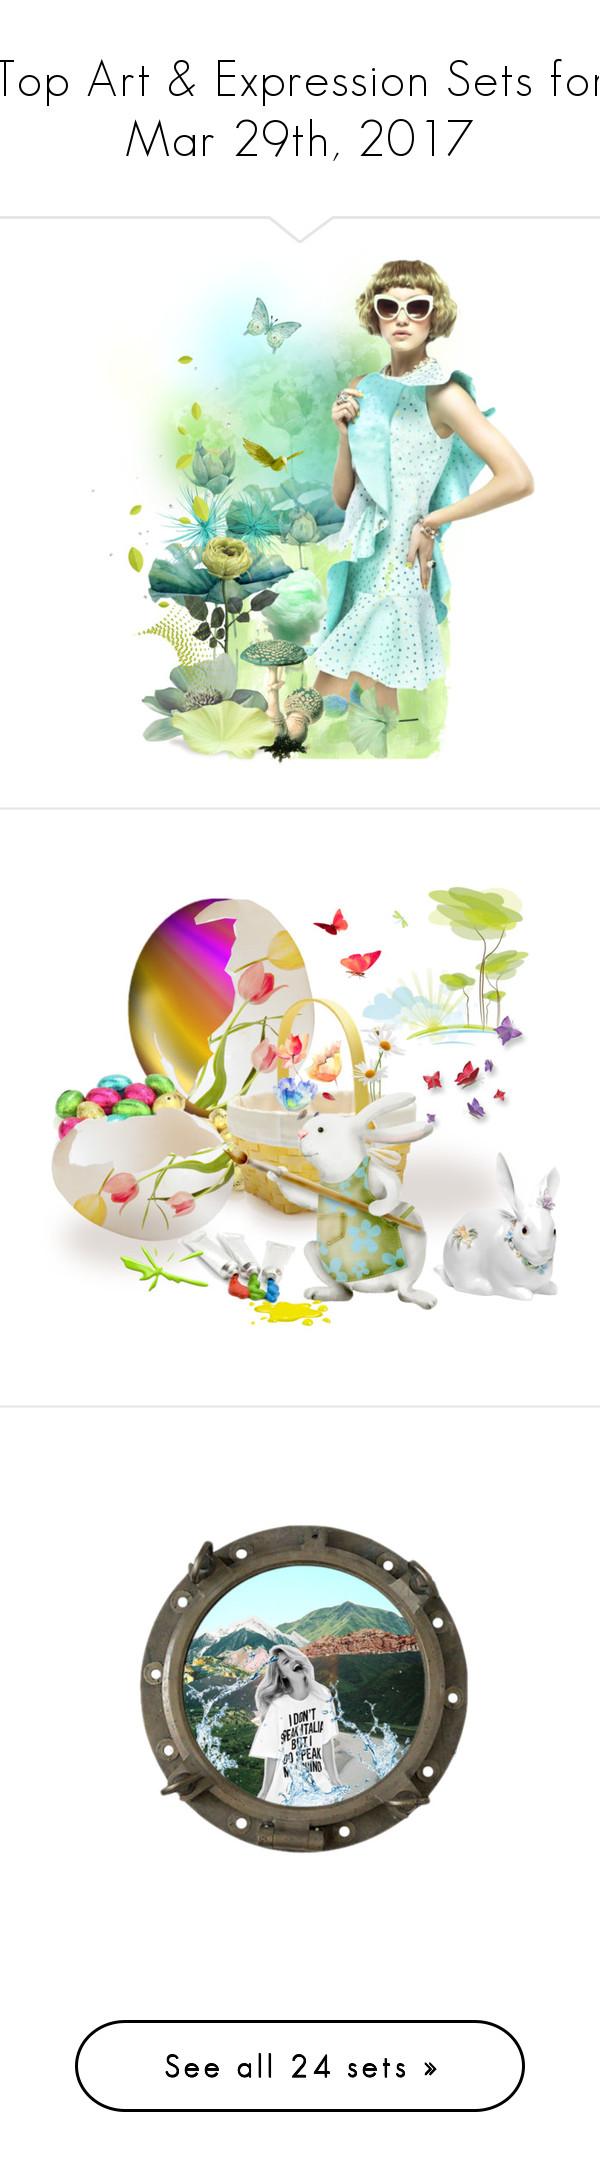 """Top Art & Expression Sets for Mar 29th, 2017"" by polyvore ❤ liked on Polyvore featuring art, polyvorecommunity, polyvoreeditorial, Easter, artset, egg, mennasartsets, noors4khunt, Rosalind and artflashmob"